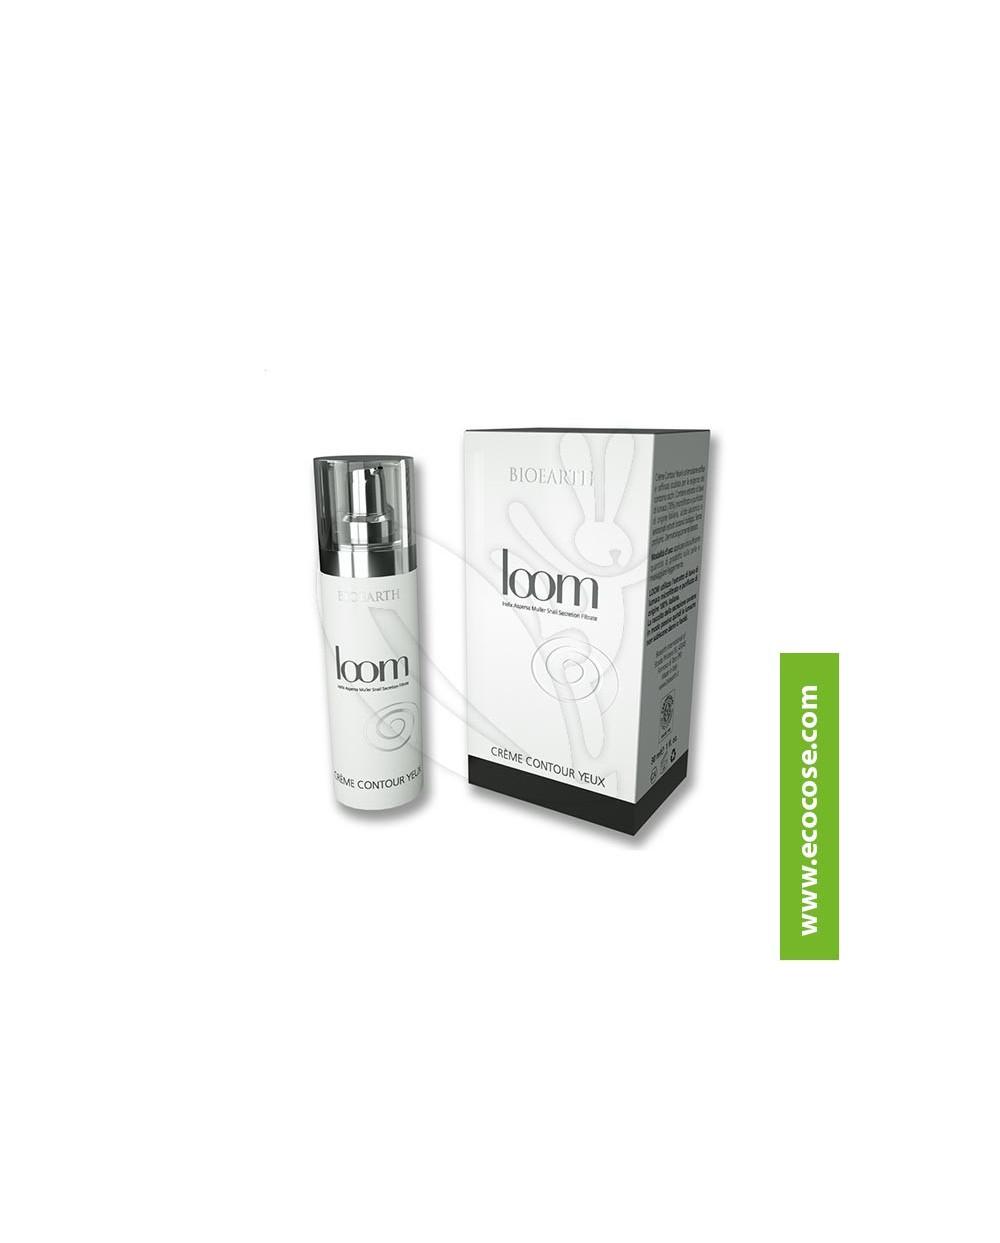 Bioearth - Loom Crème Contour Yeux - Crema Contorno occhi